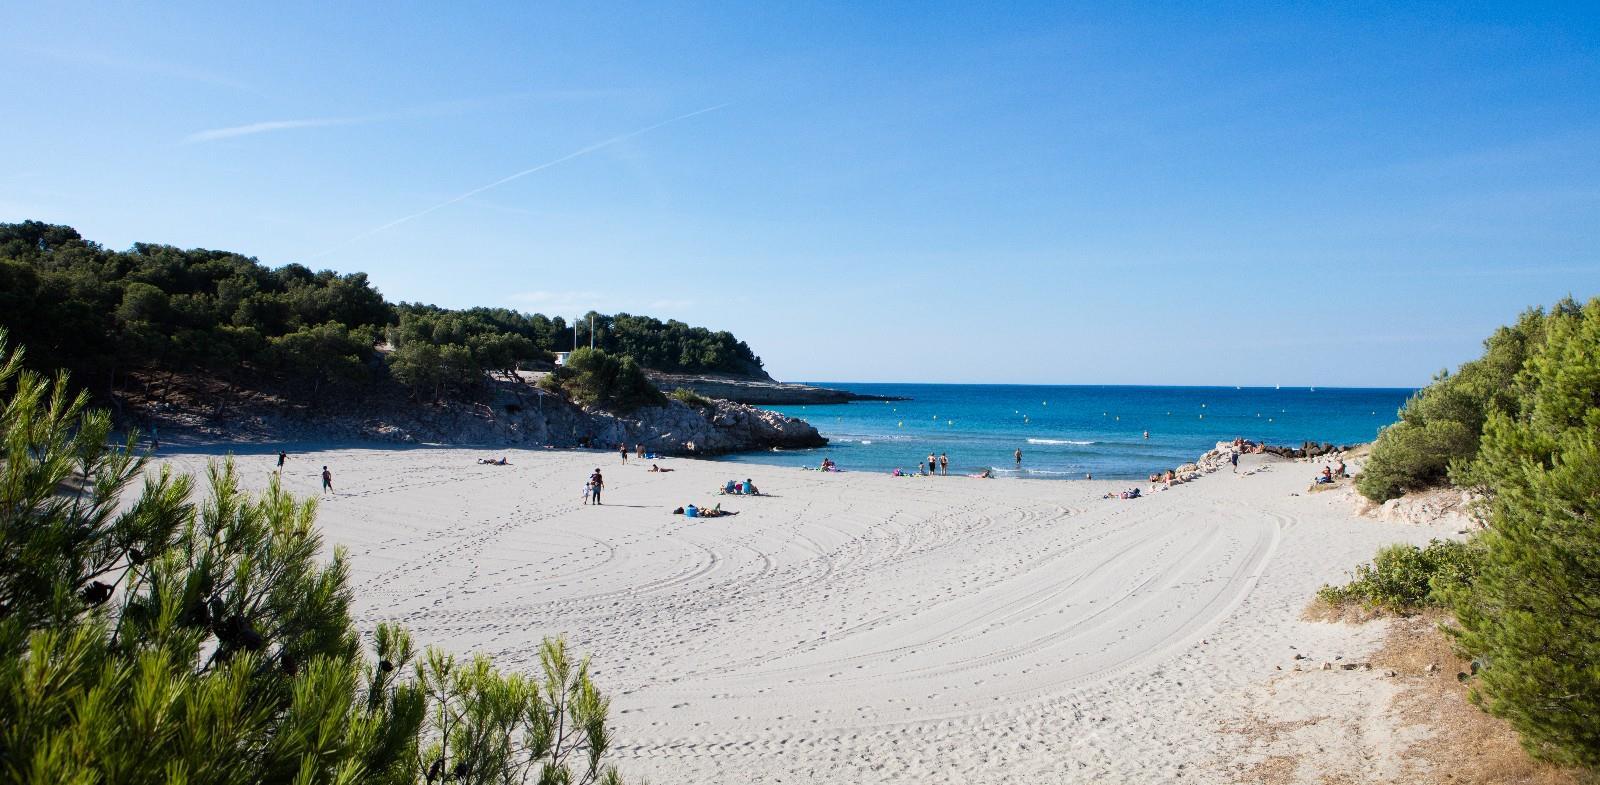 Camping Pascalounet, Martigues, Bouches-du-Rhône